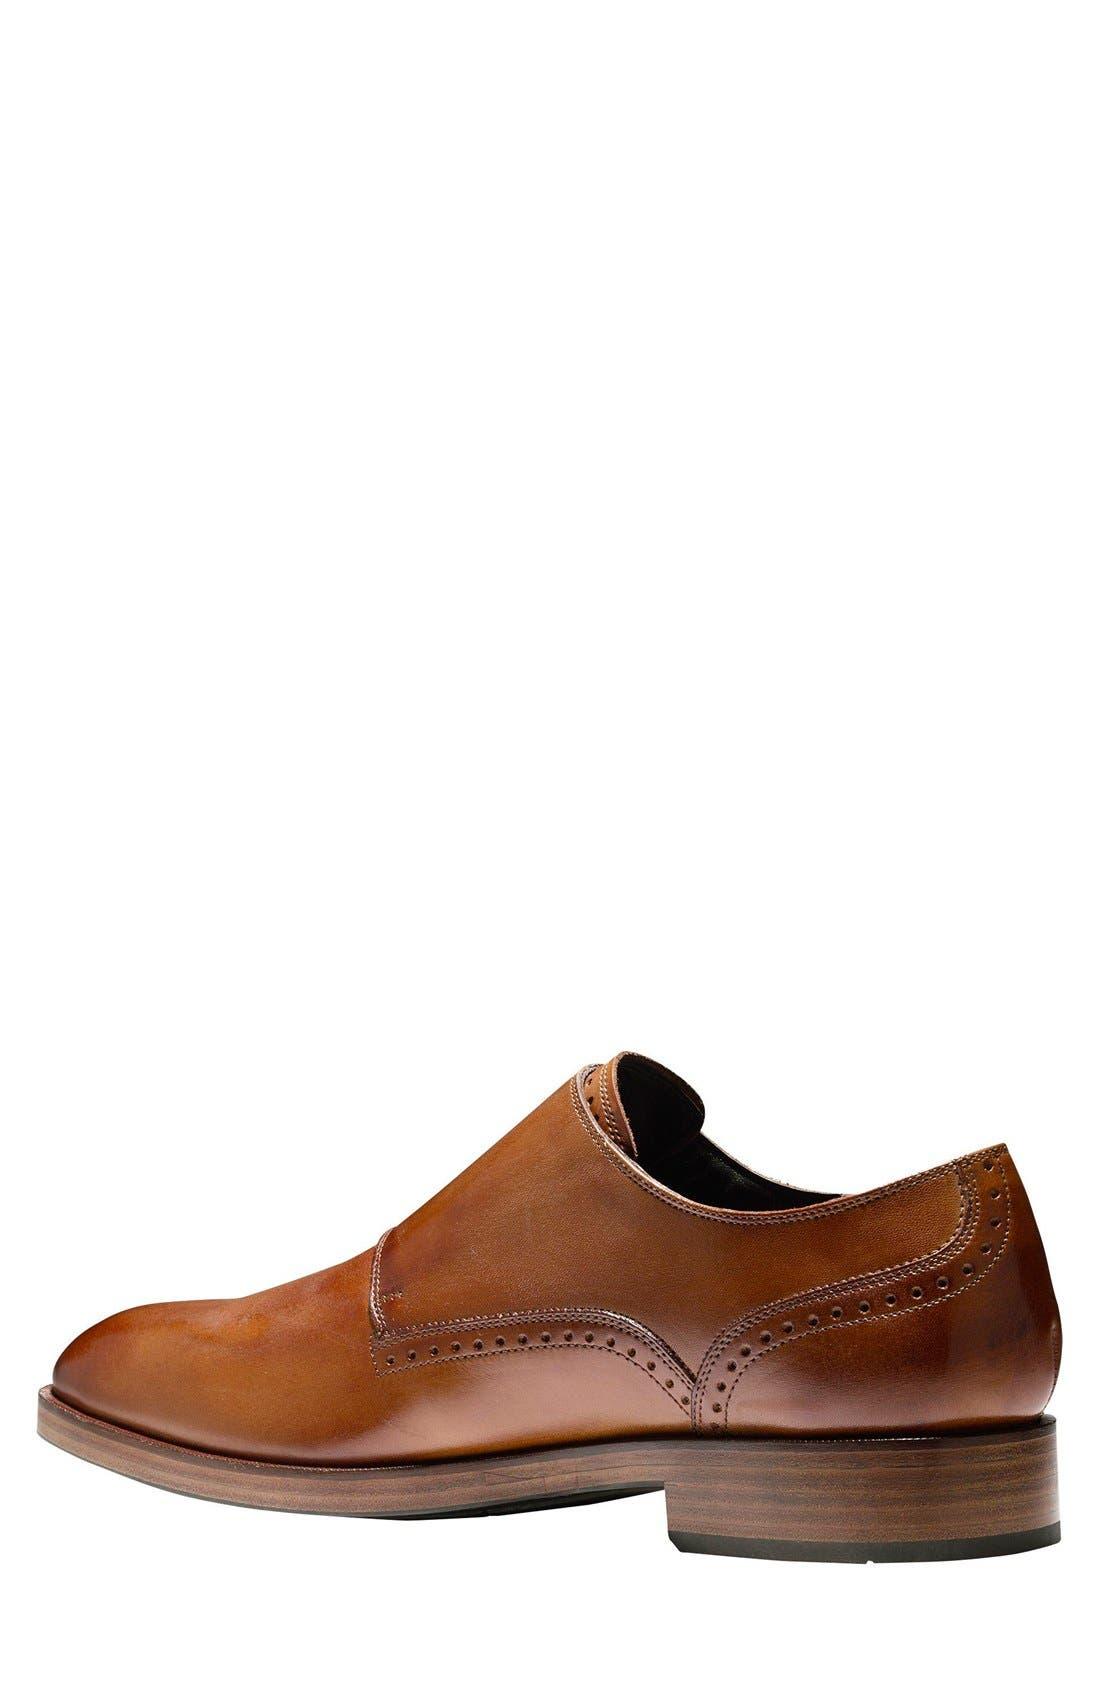 Alternate Image 2  - Cole Haan 'Harrison' Double Monk Strap Shoe (Men)